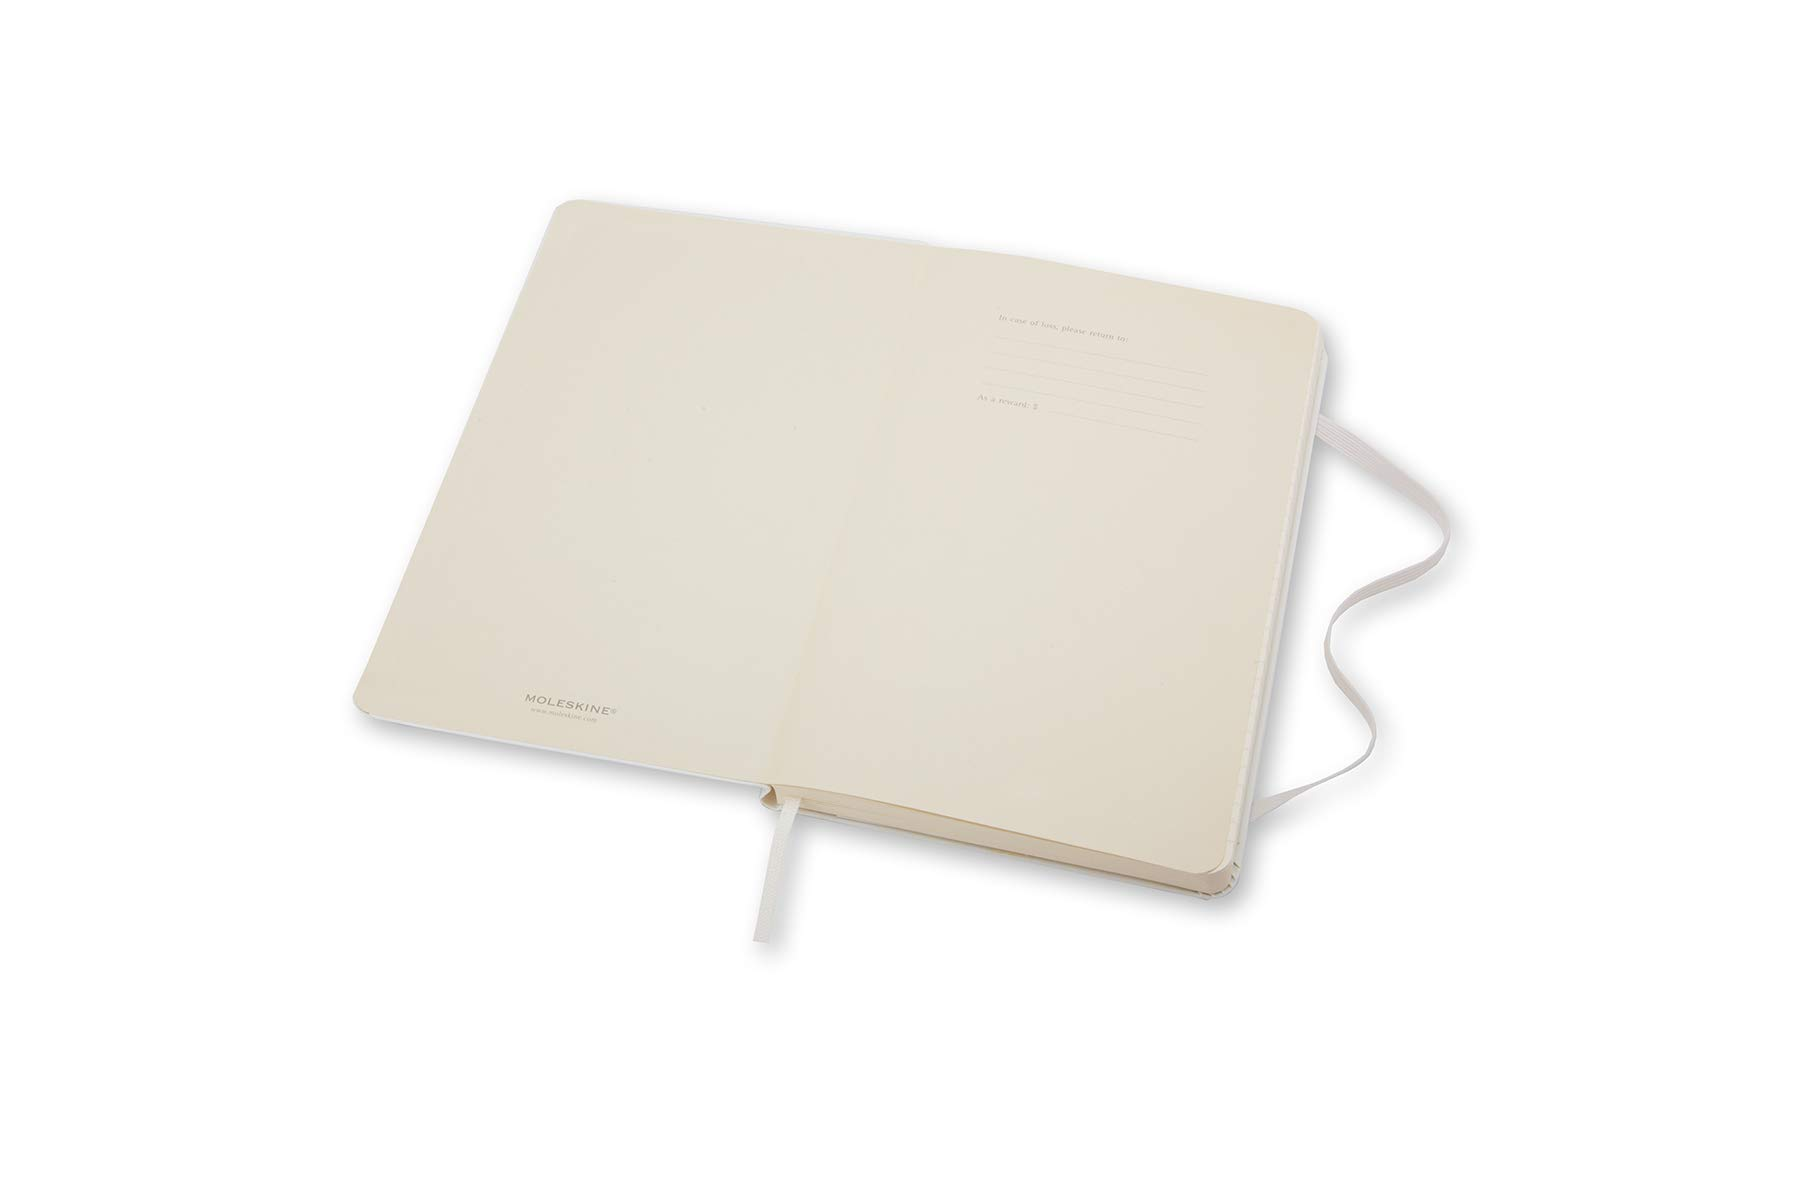 Moleskine Classic Notebook, Hard Cover, Large (5'' x 8.25'') Ruled/Lined, White by Moleskine (Image #3)